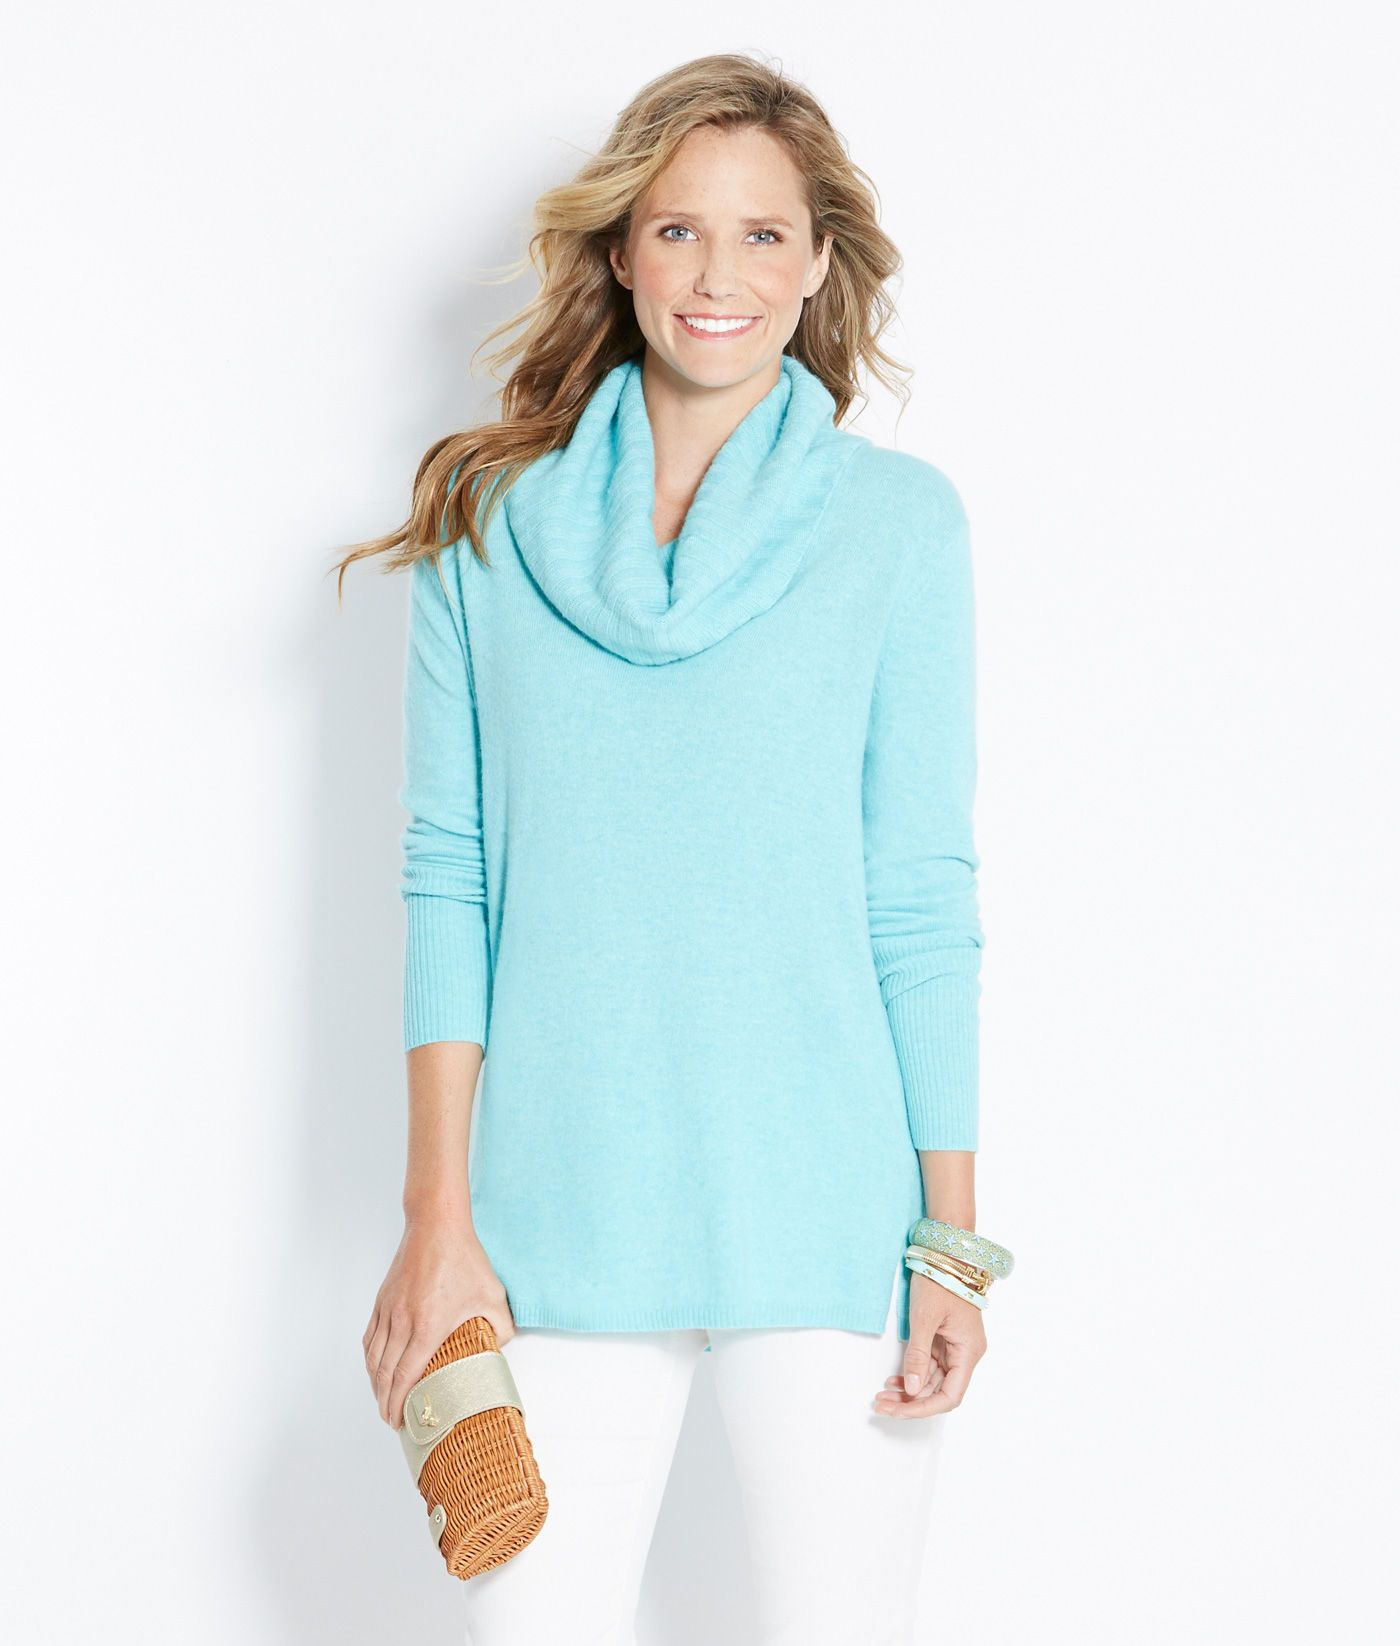 Shop Sweaters: Sherwood Cowlneck Sweater for Women | Vineyard ...